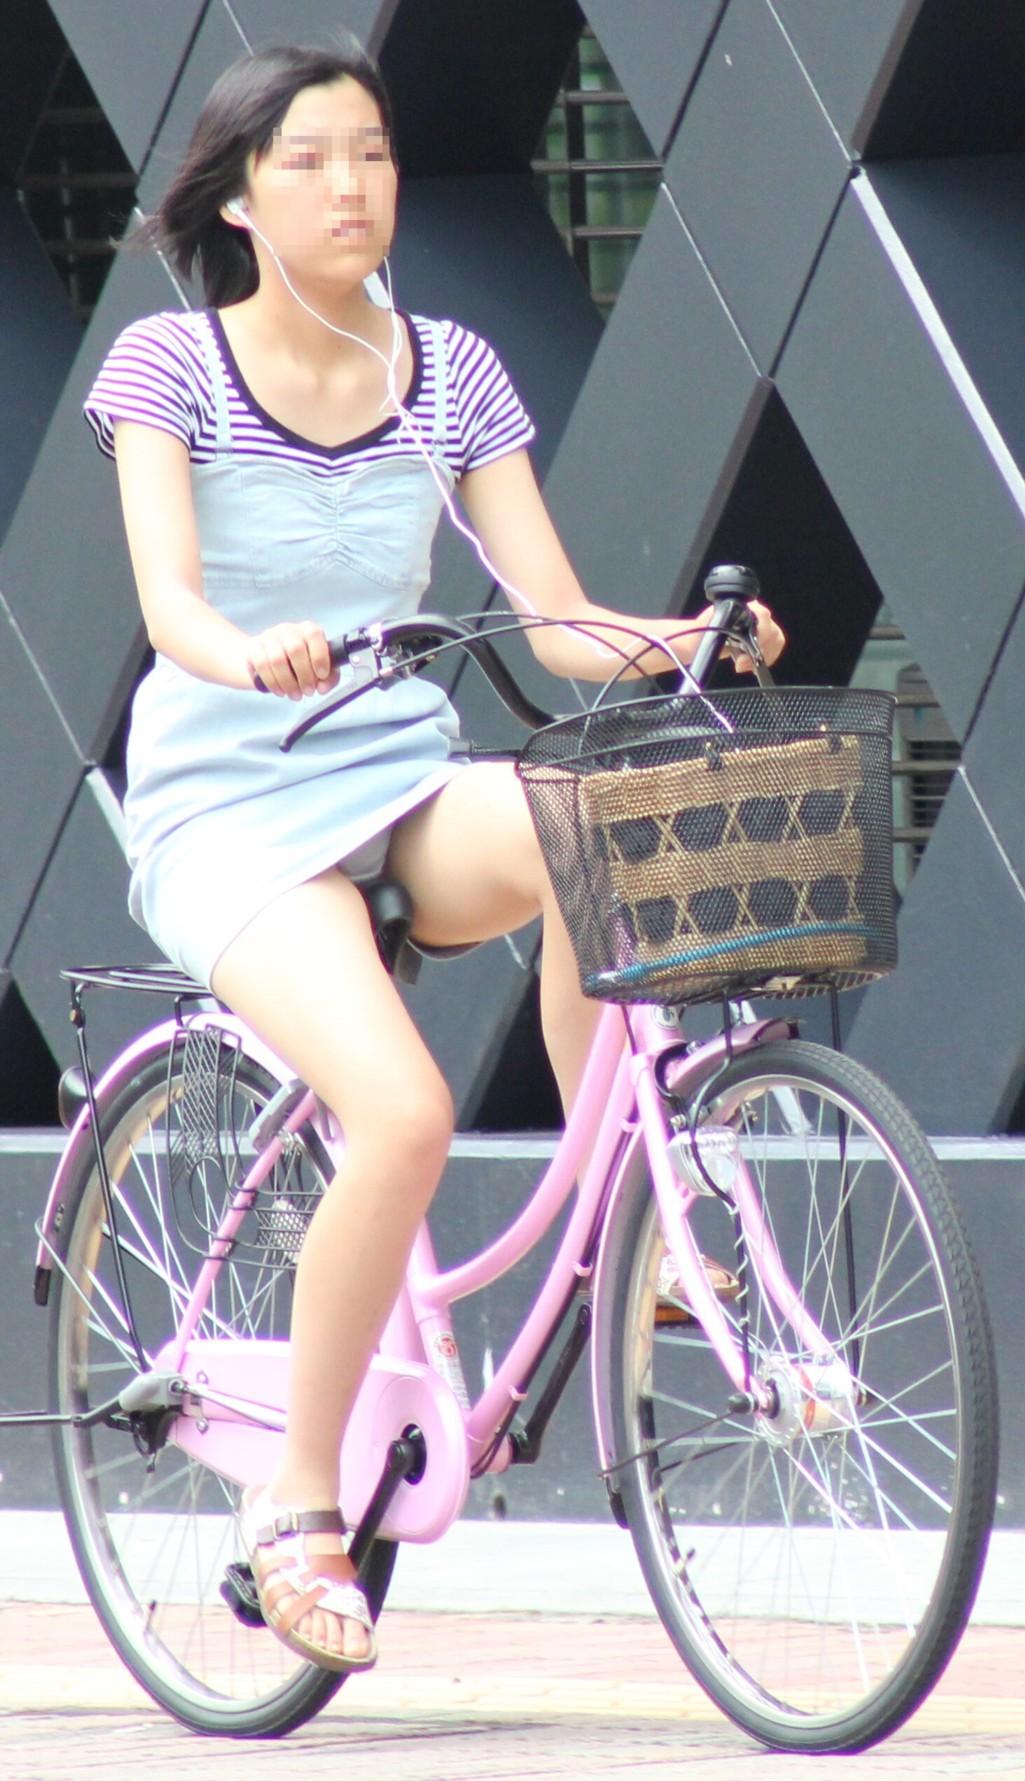 OLの漕いでる時が狙いめ自転車三角盗撮エロ画像7枚目